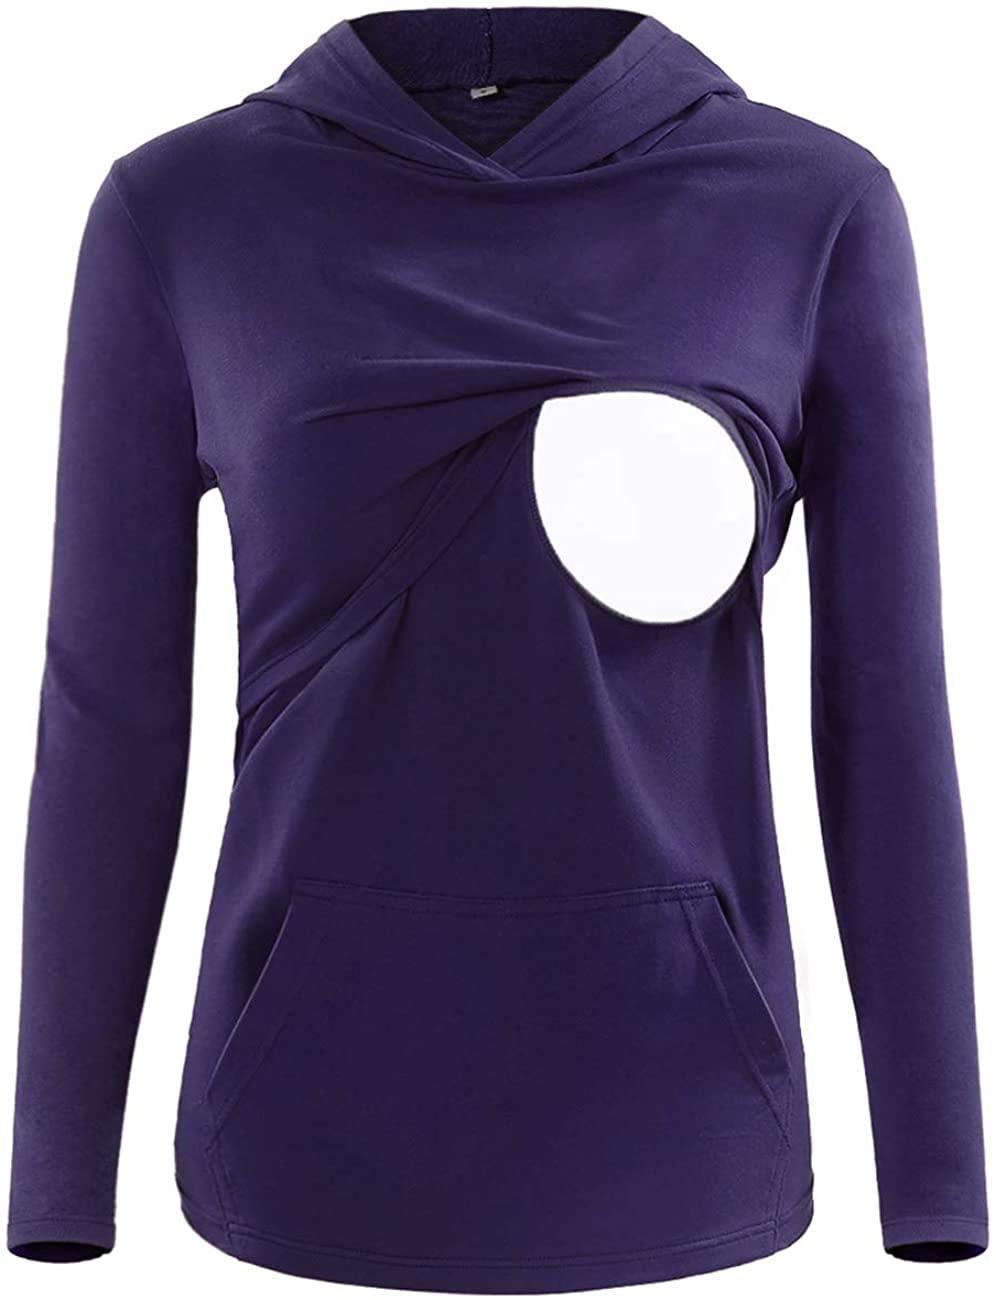 SUNNYBUY Women's Long Sleeve Nursing Top Shirt Maternity Breastfeeding Tops Clothes Casual Sweatshirt with Pocket(Purple-XL)